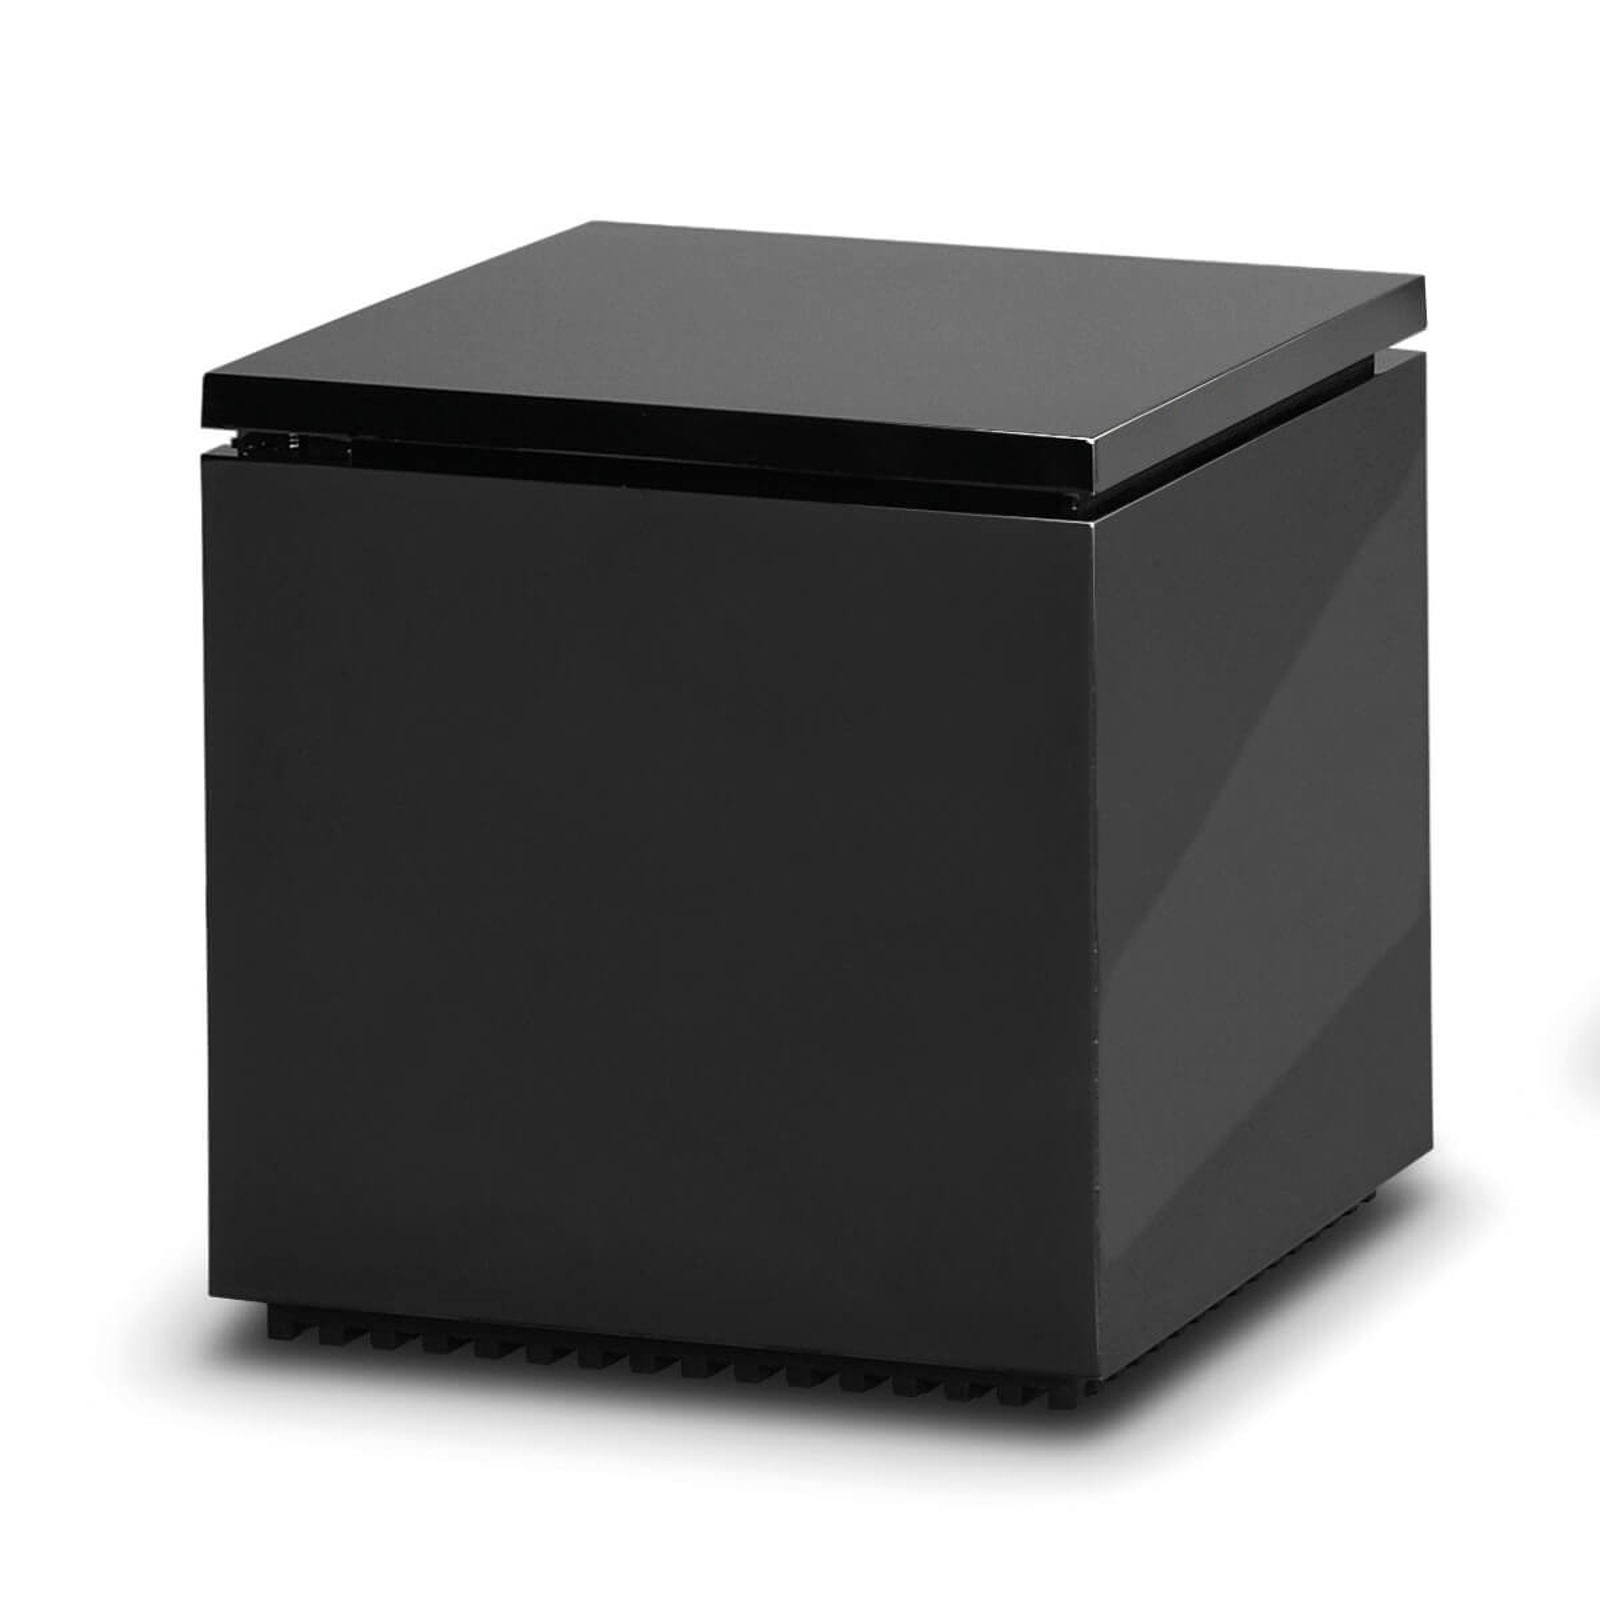 Cini&Nils Cuboled - LED-Tischleuchte in Schwarz